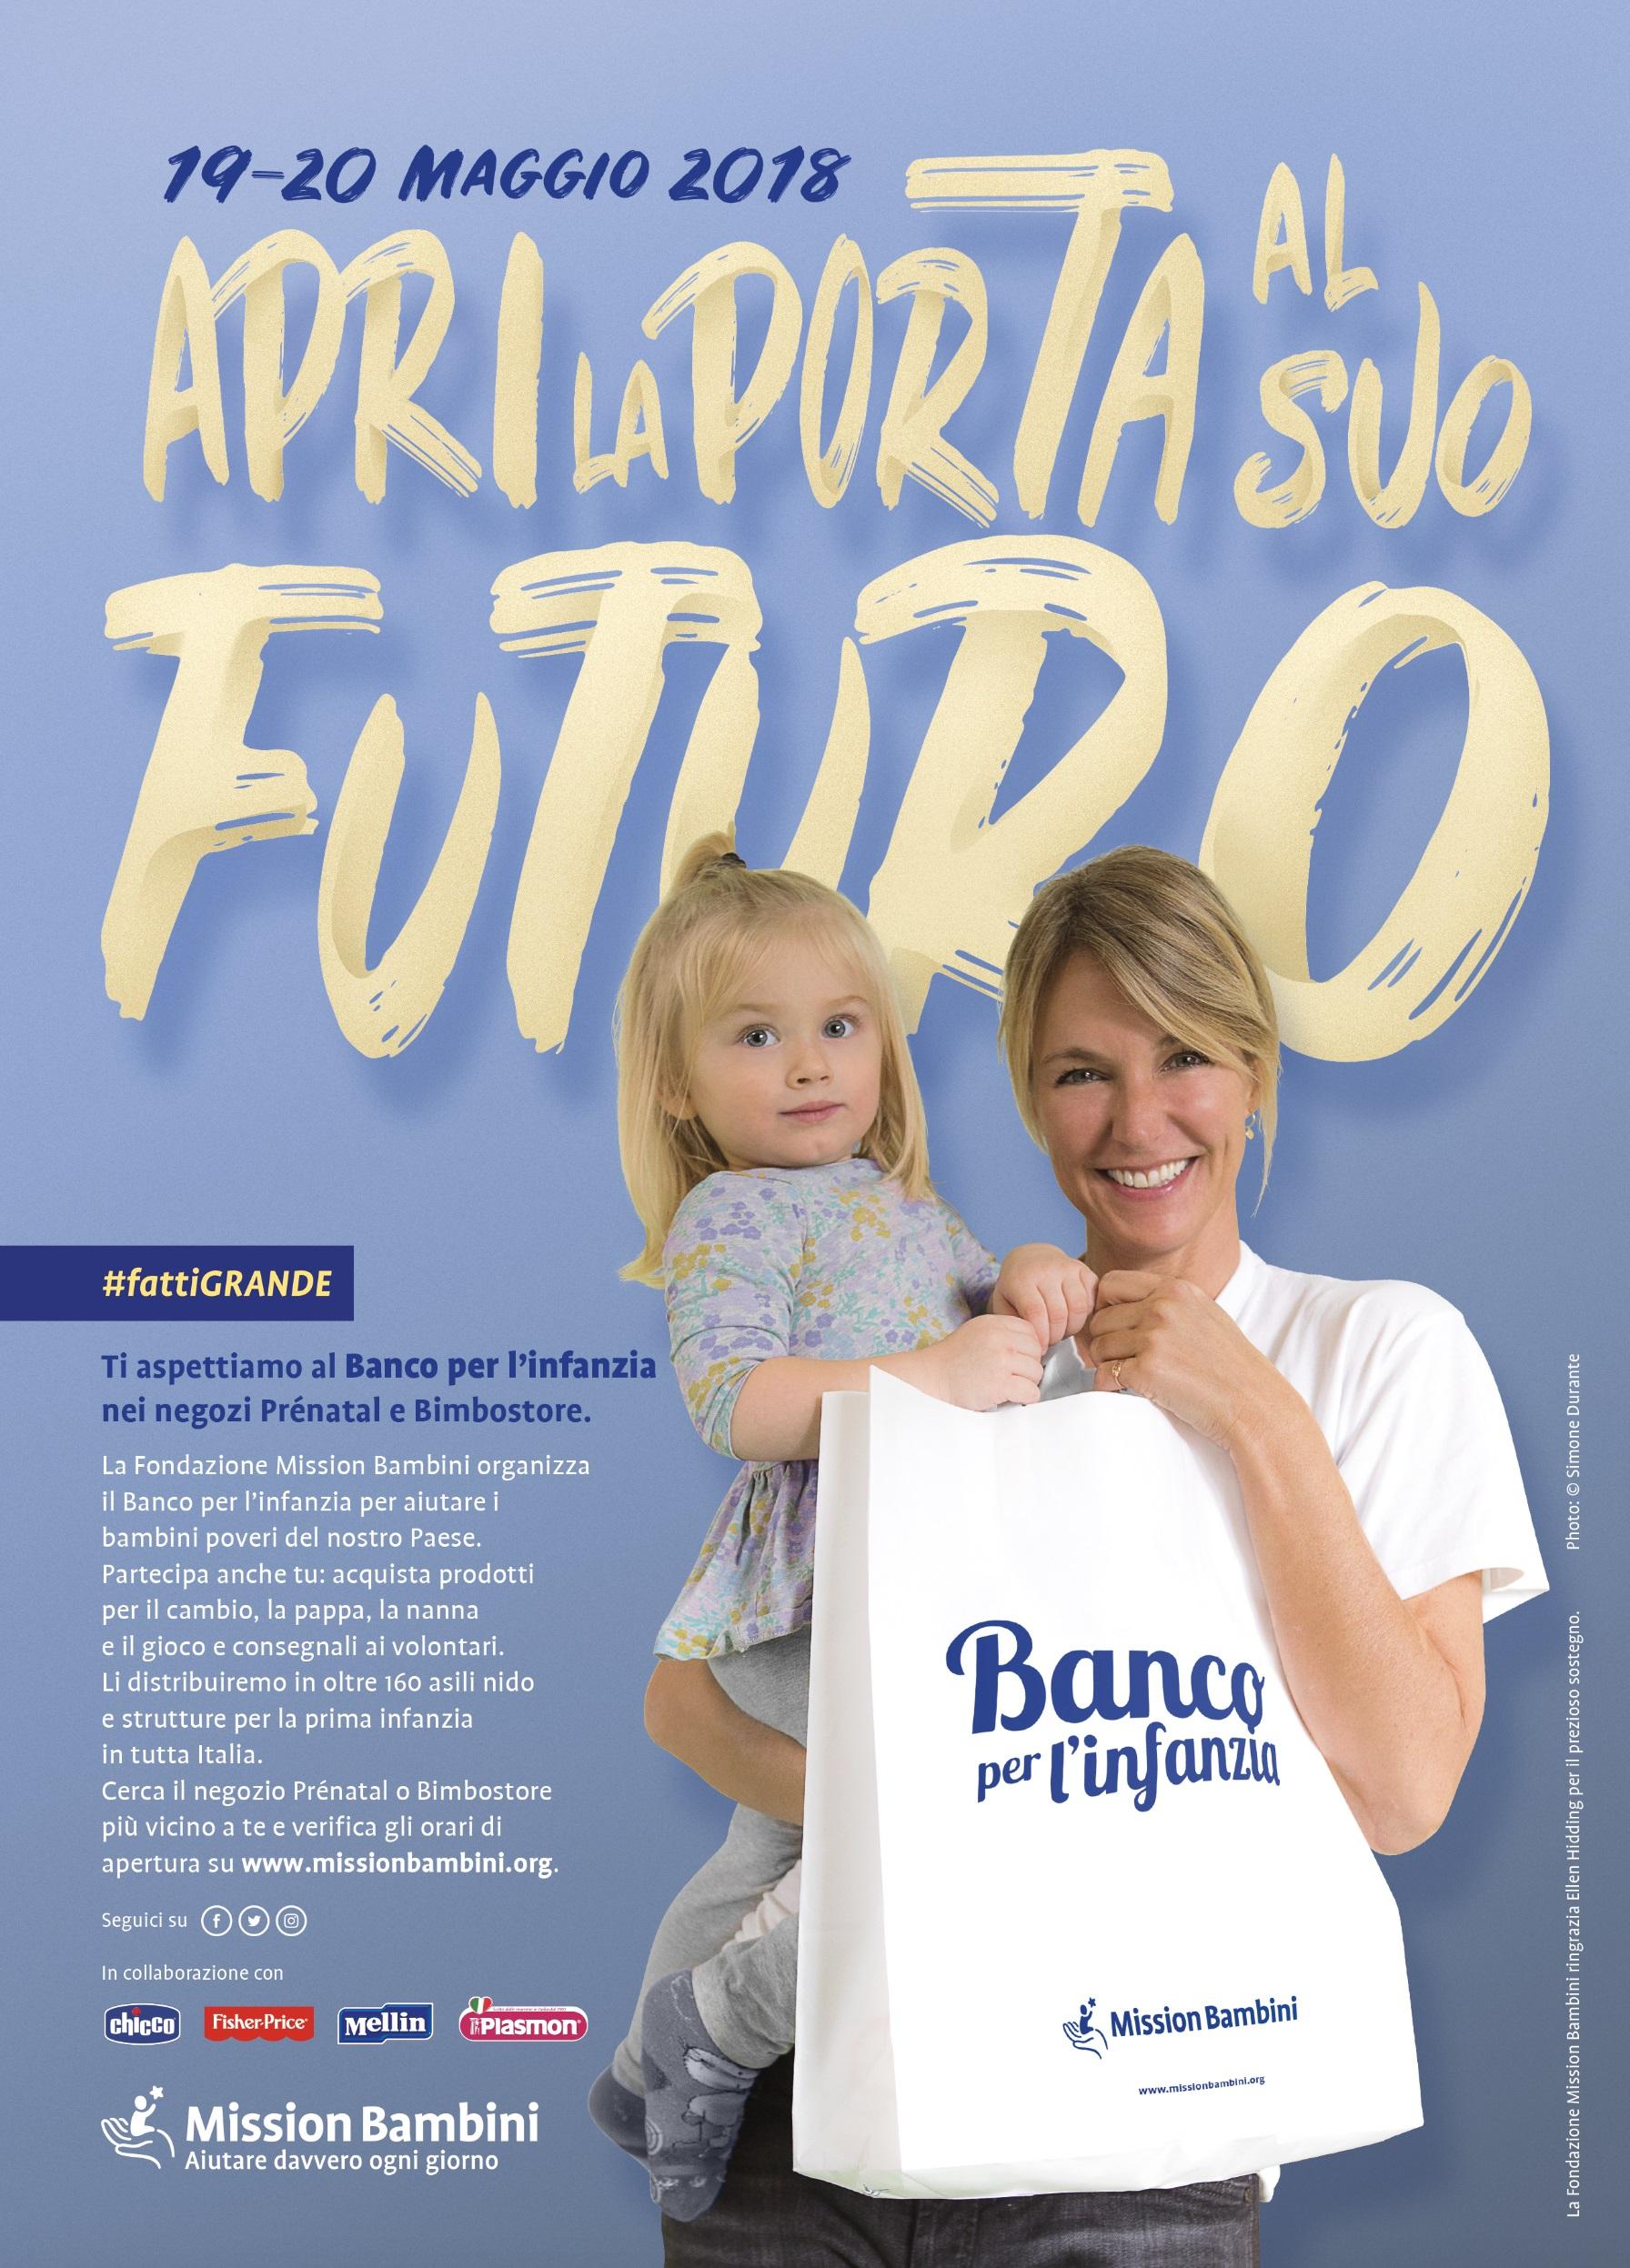 http://www.salernonotizie.net/wp-content/uploads/2018/05/Banco-per-linfanzia.jpg